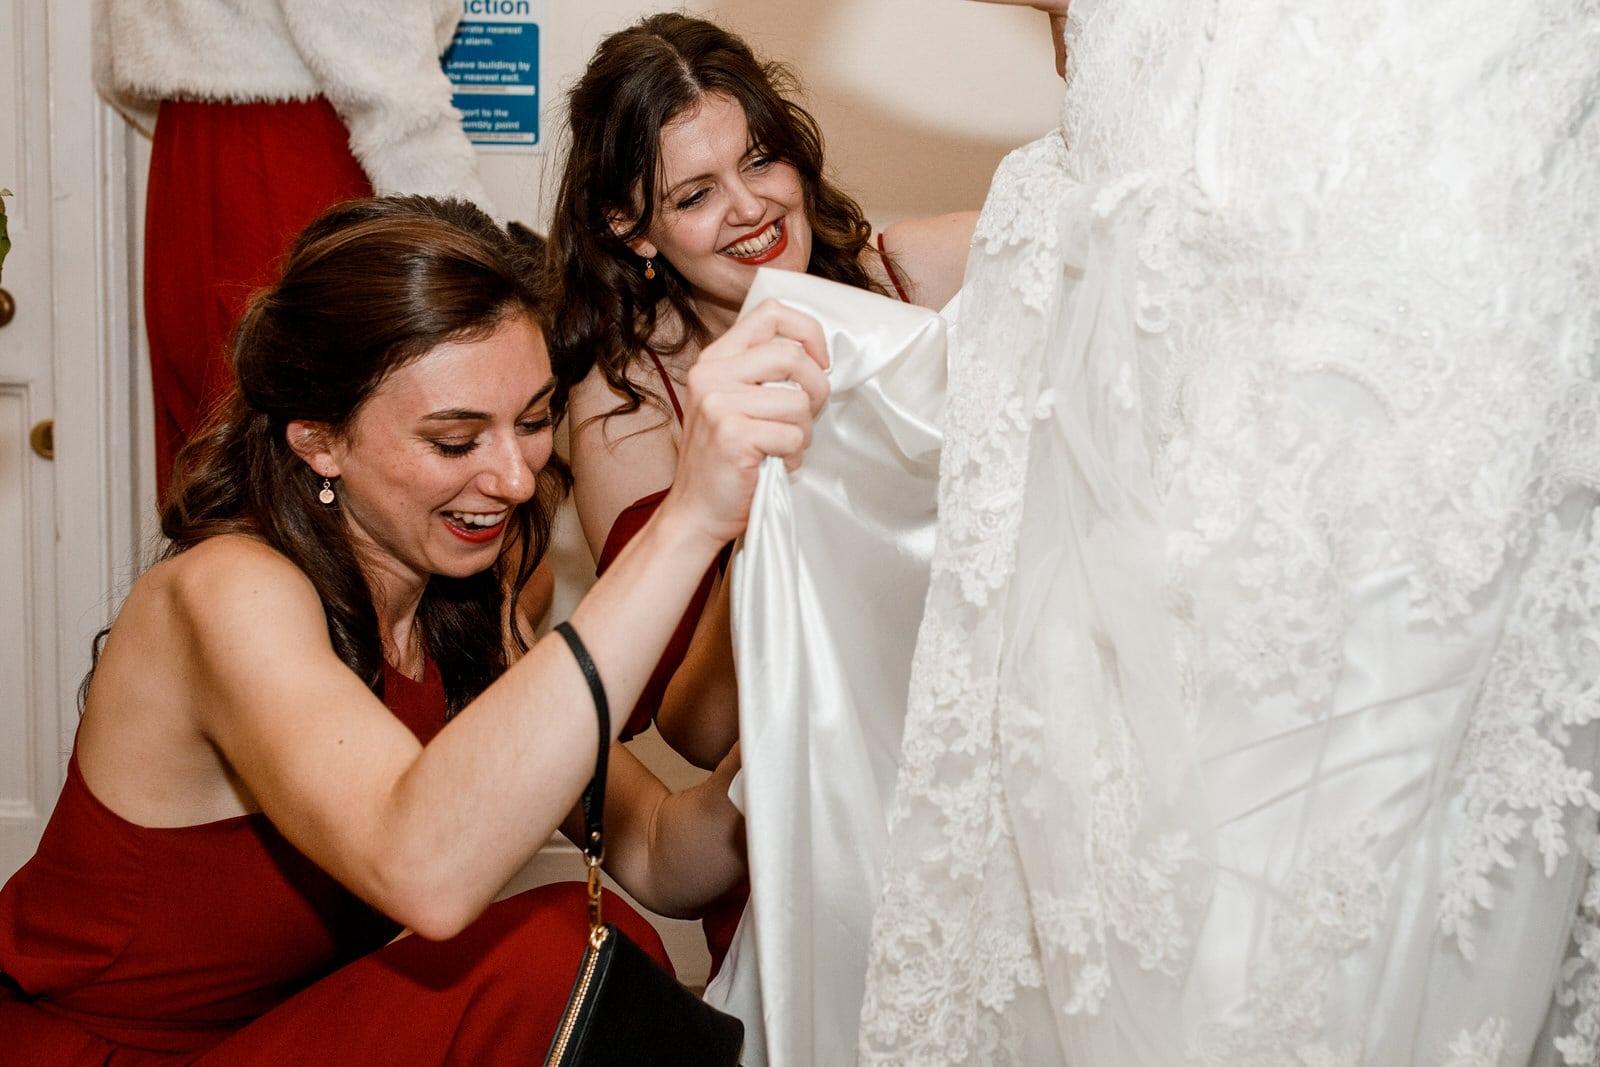 bridesmaid looking up brides dress and laughing